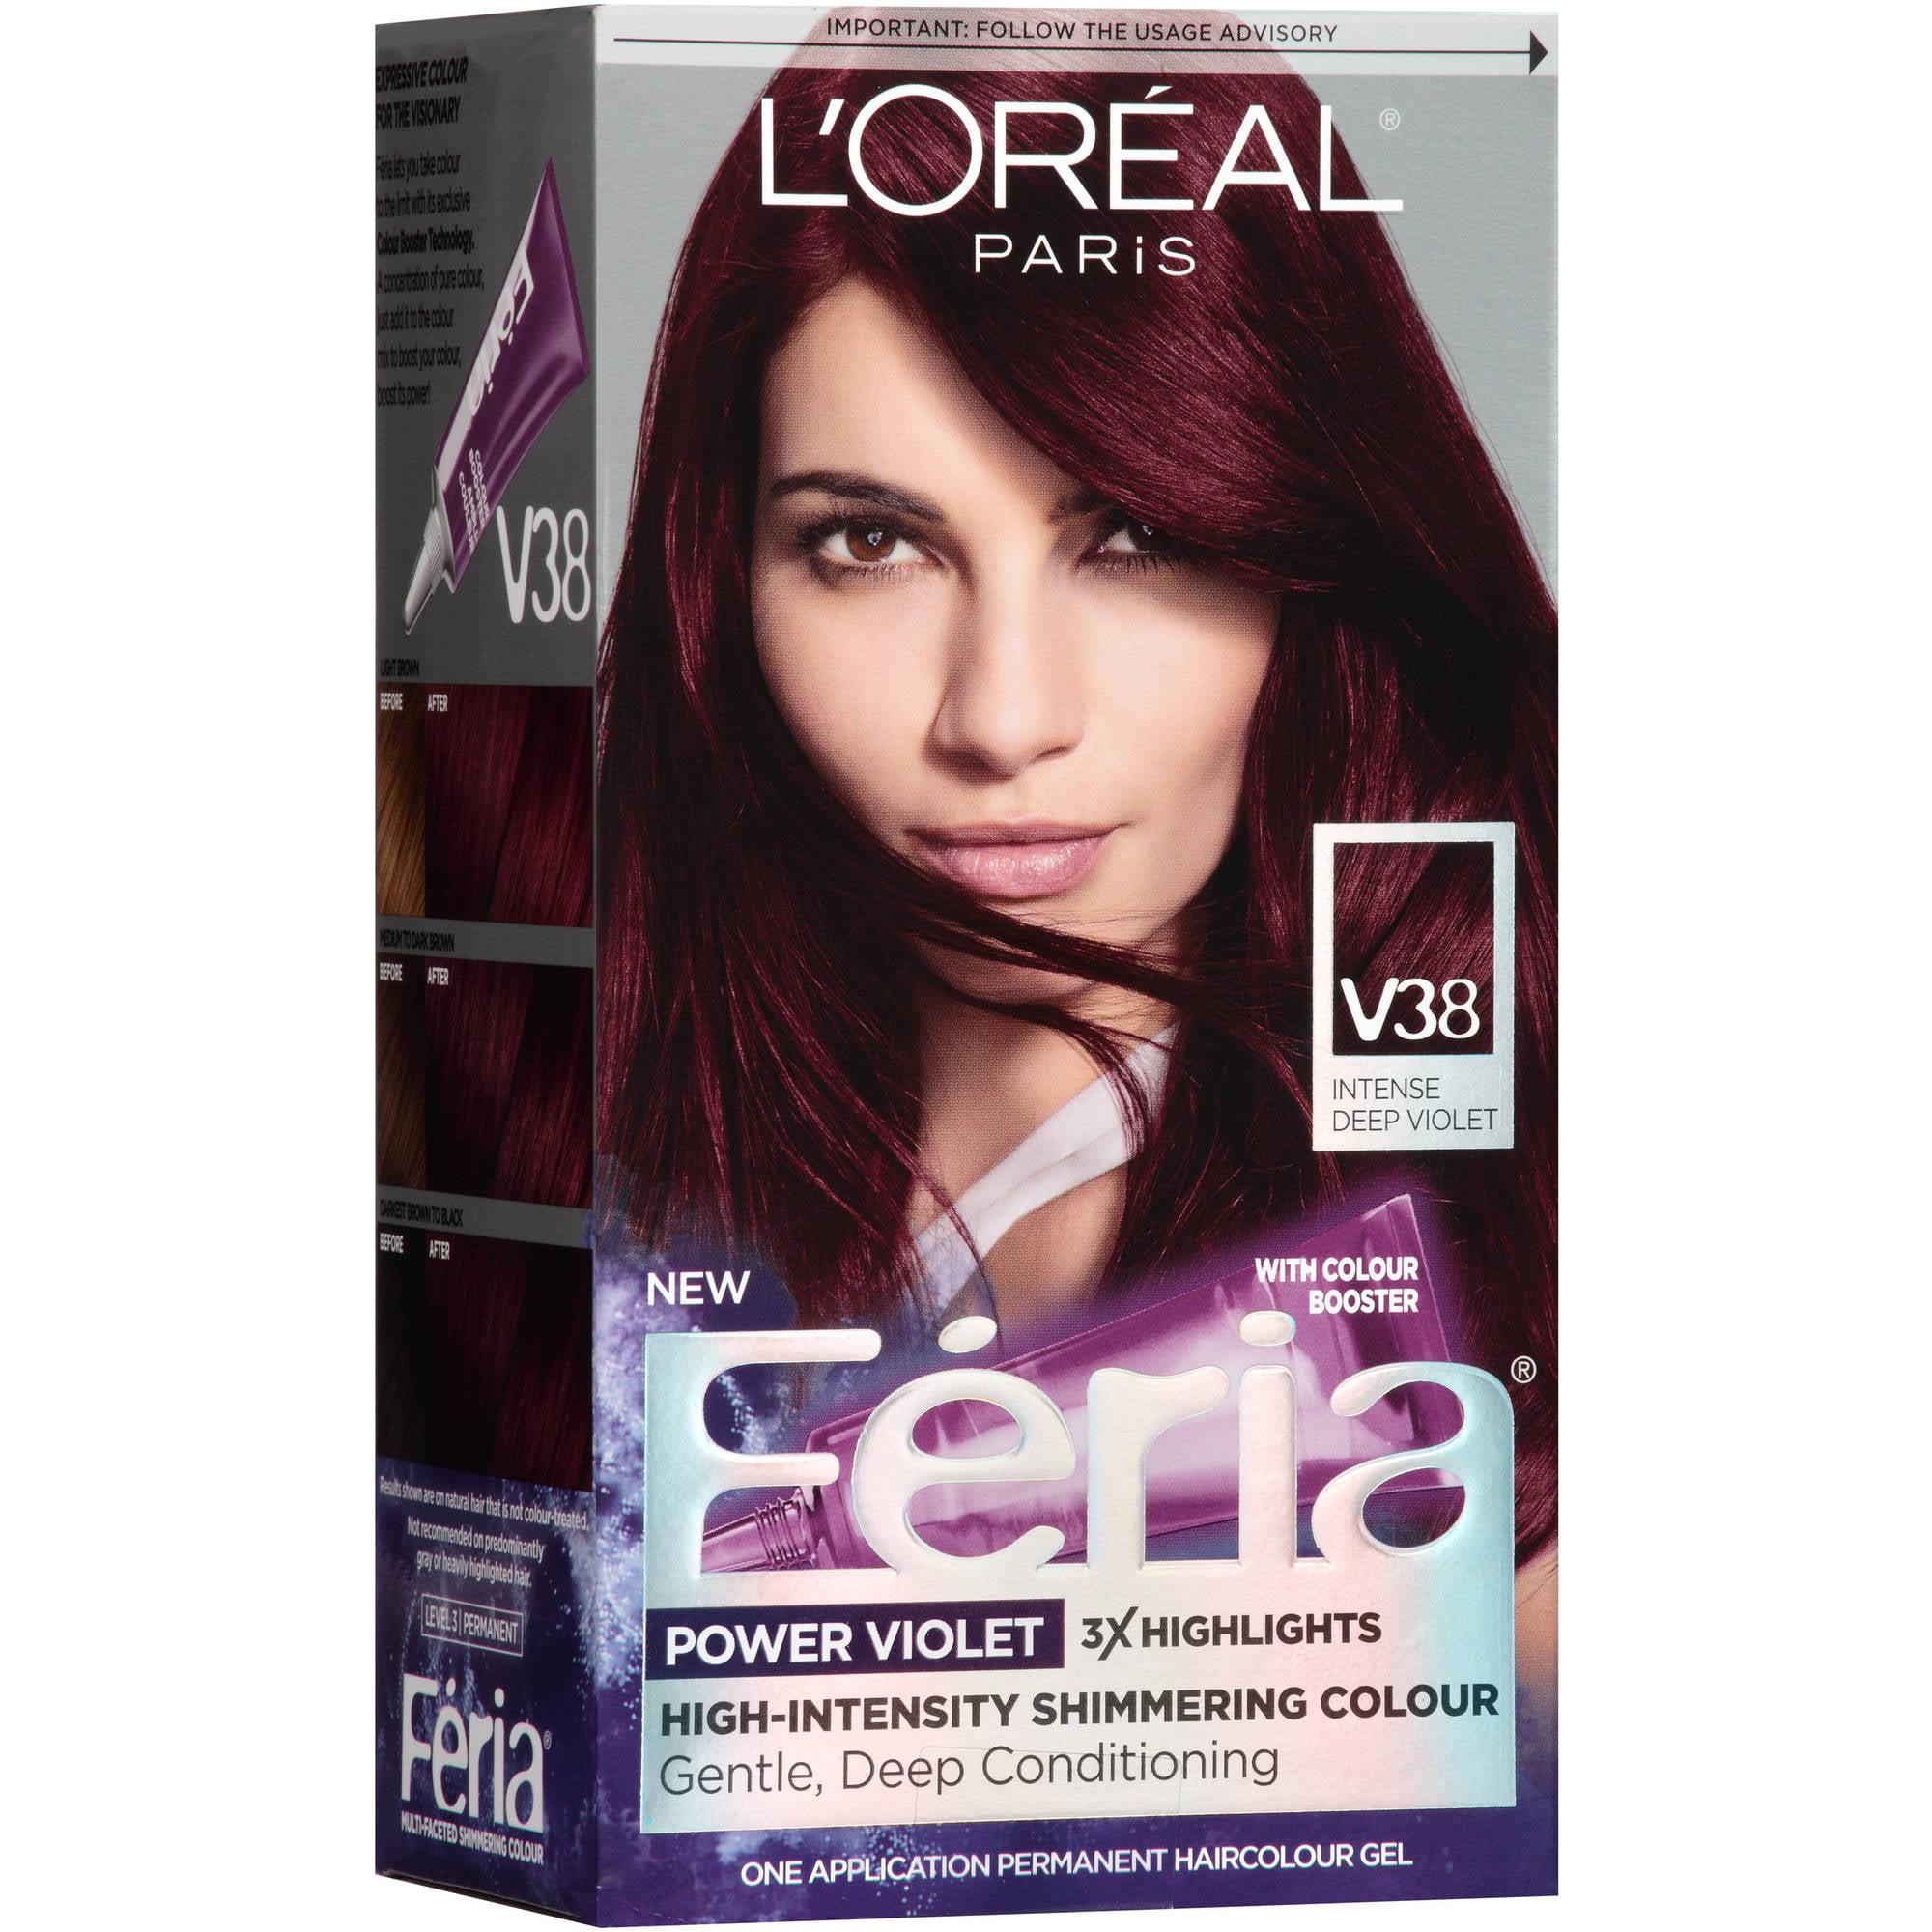 L Oreal Paris Feria Power Violet Hair Color Gel Kit V38